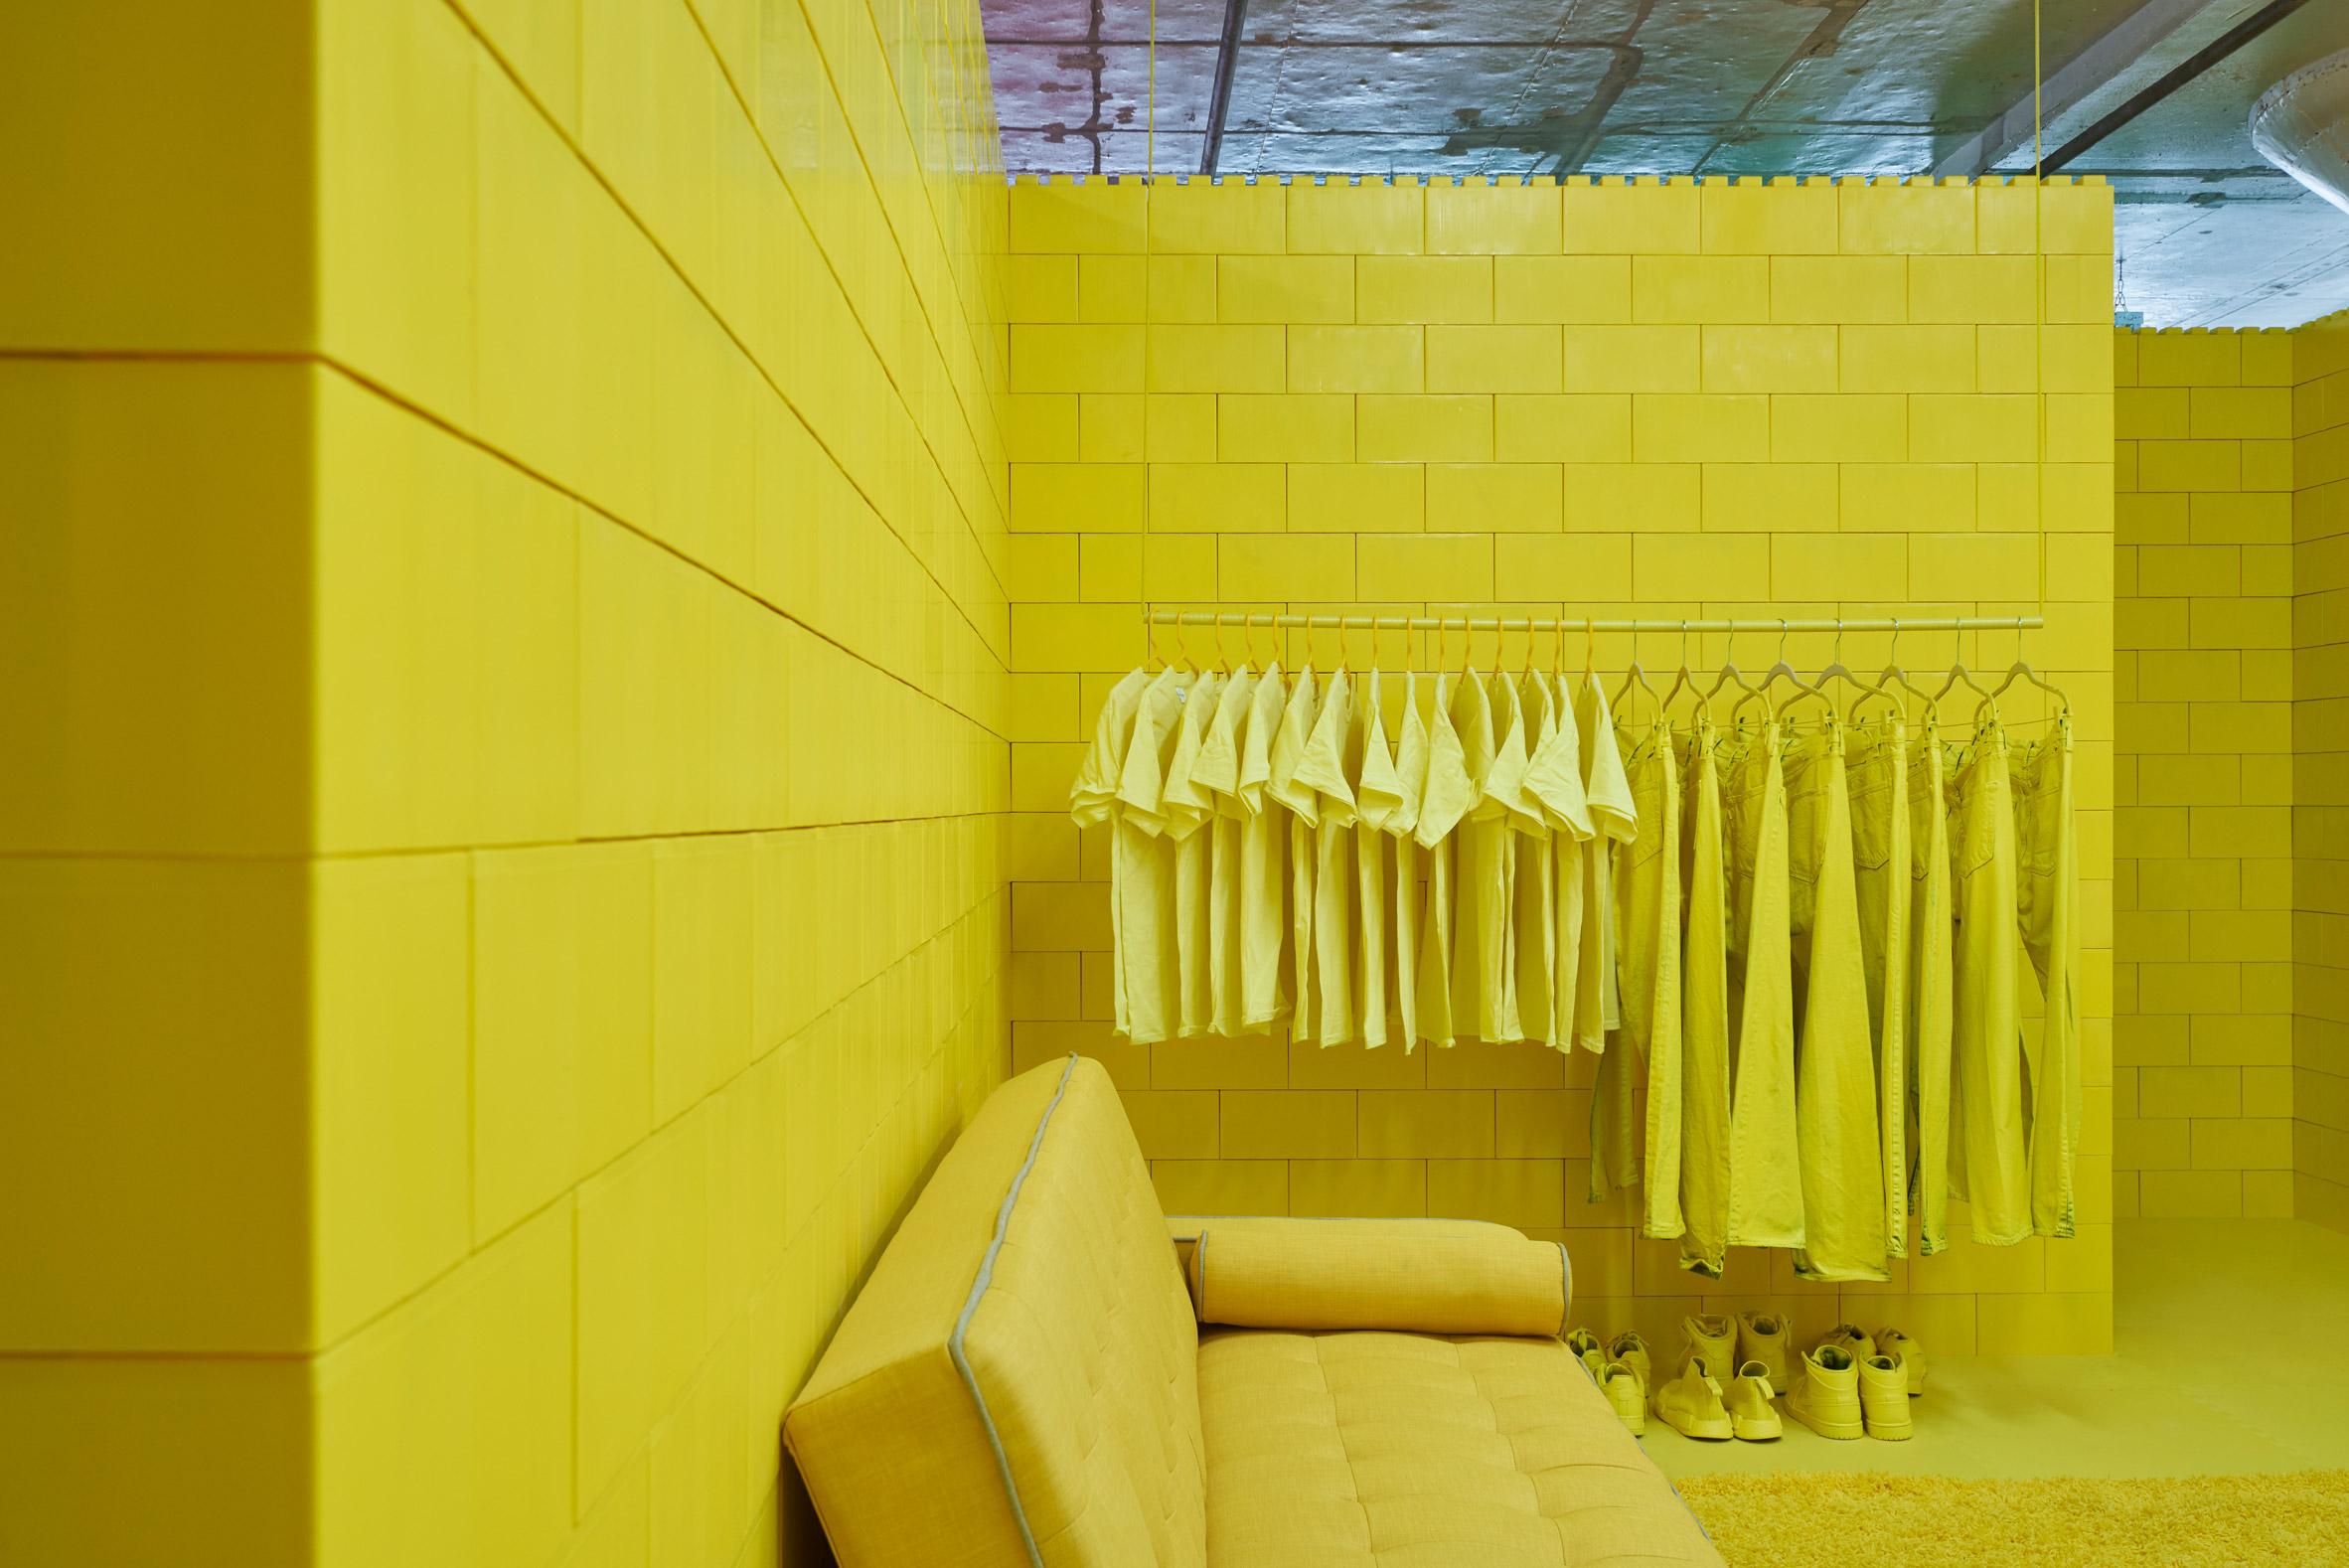 monochrome-cj-hendry-brooklyn-exhibition-colour-rooms-new-york-usa_dezeen_2364_col_12.jpg